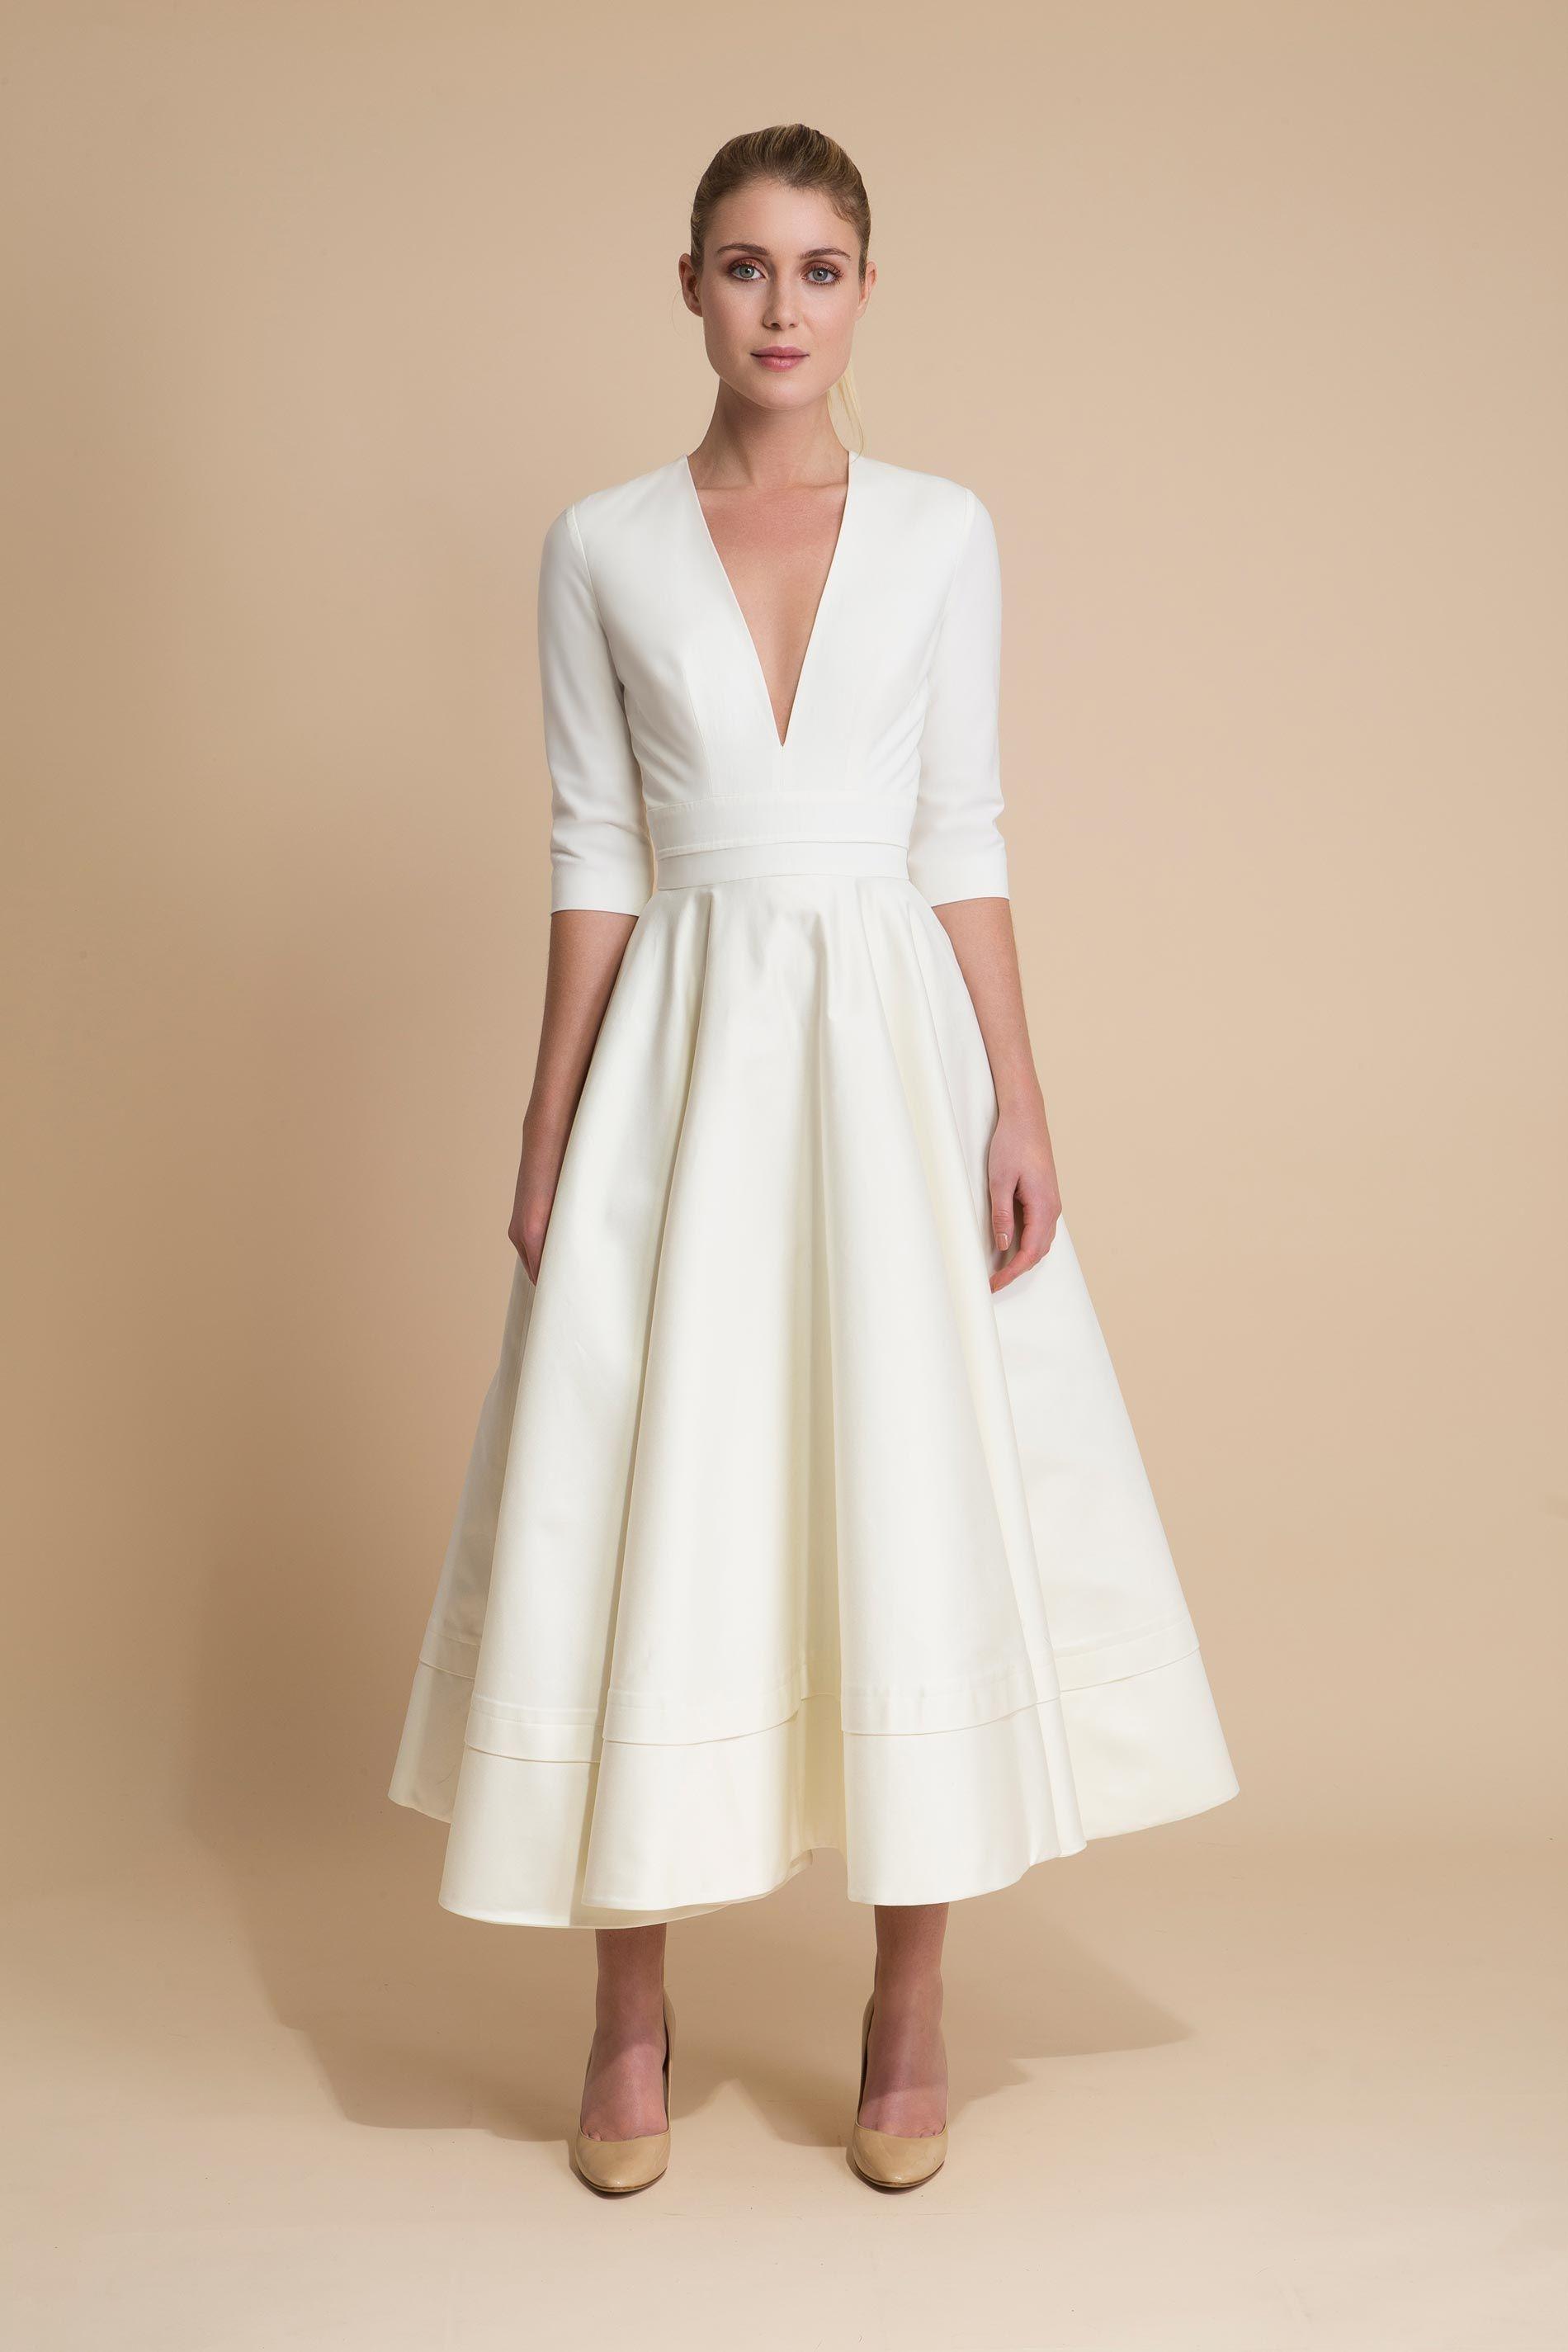 Robe de mari e vintage ann e 50 fashion designs - Robe de mariee annee 60 ...